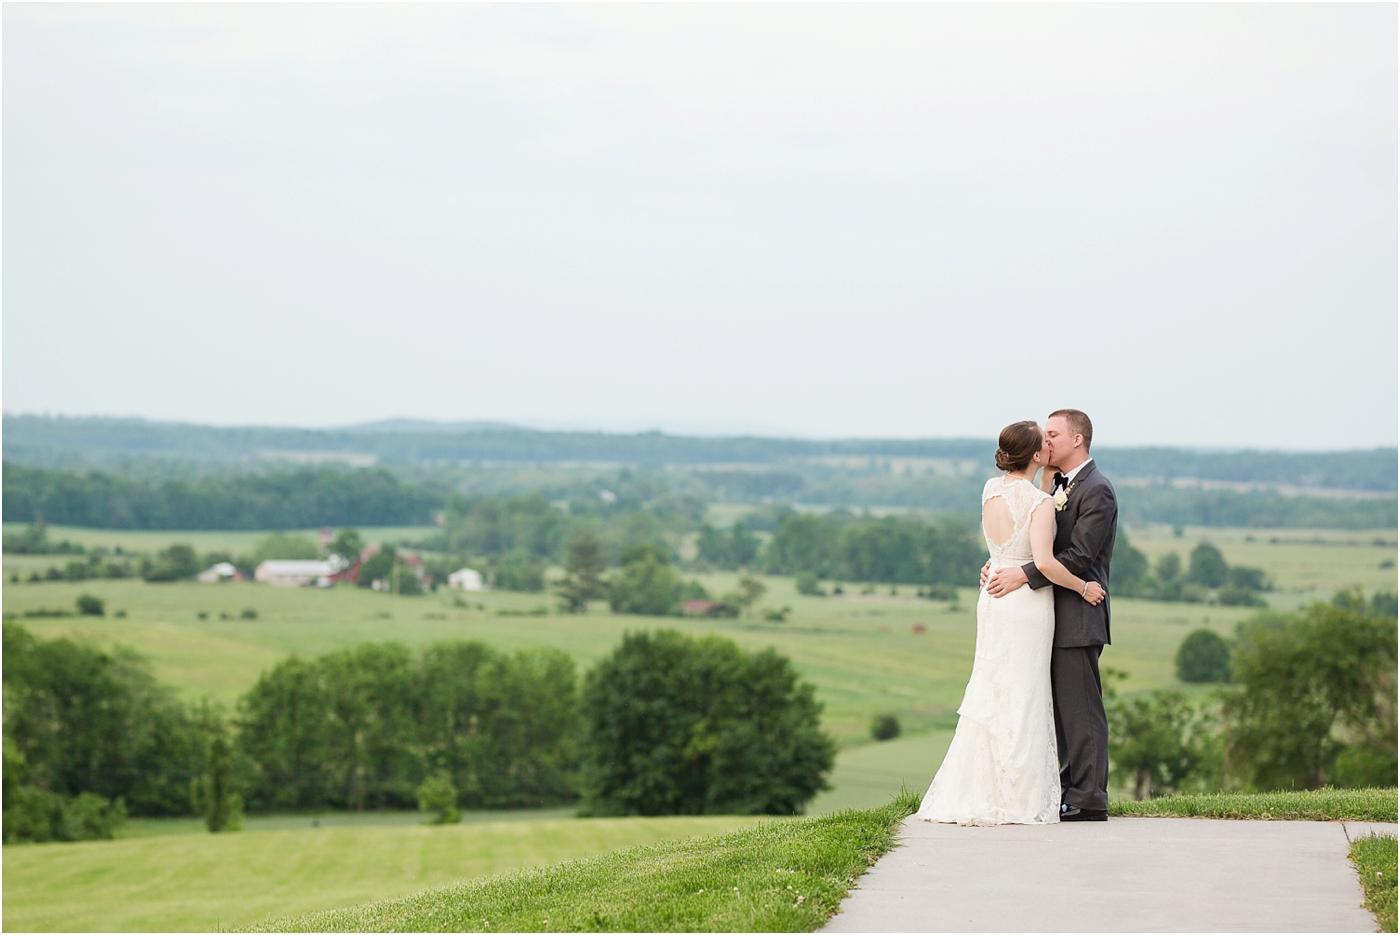 Gettysburg-lodges-wedding-photos-100.jpg